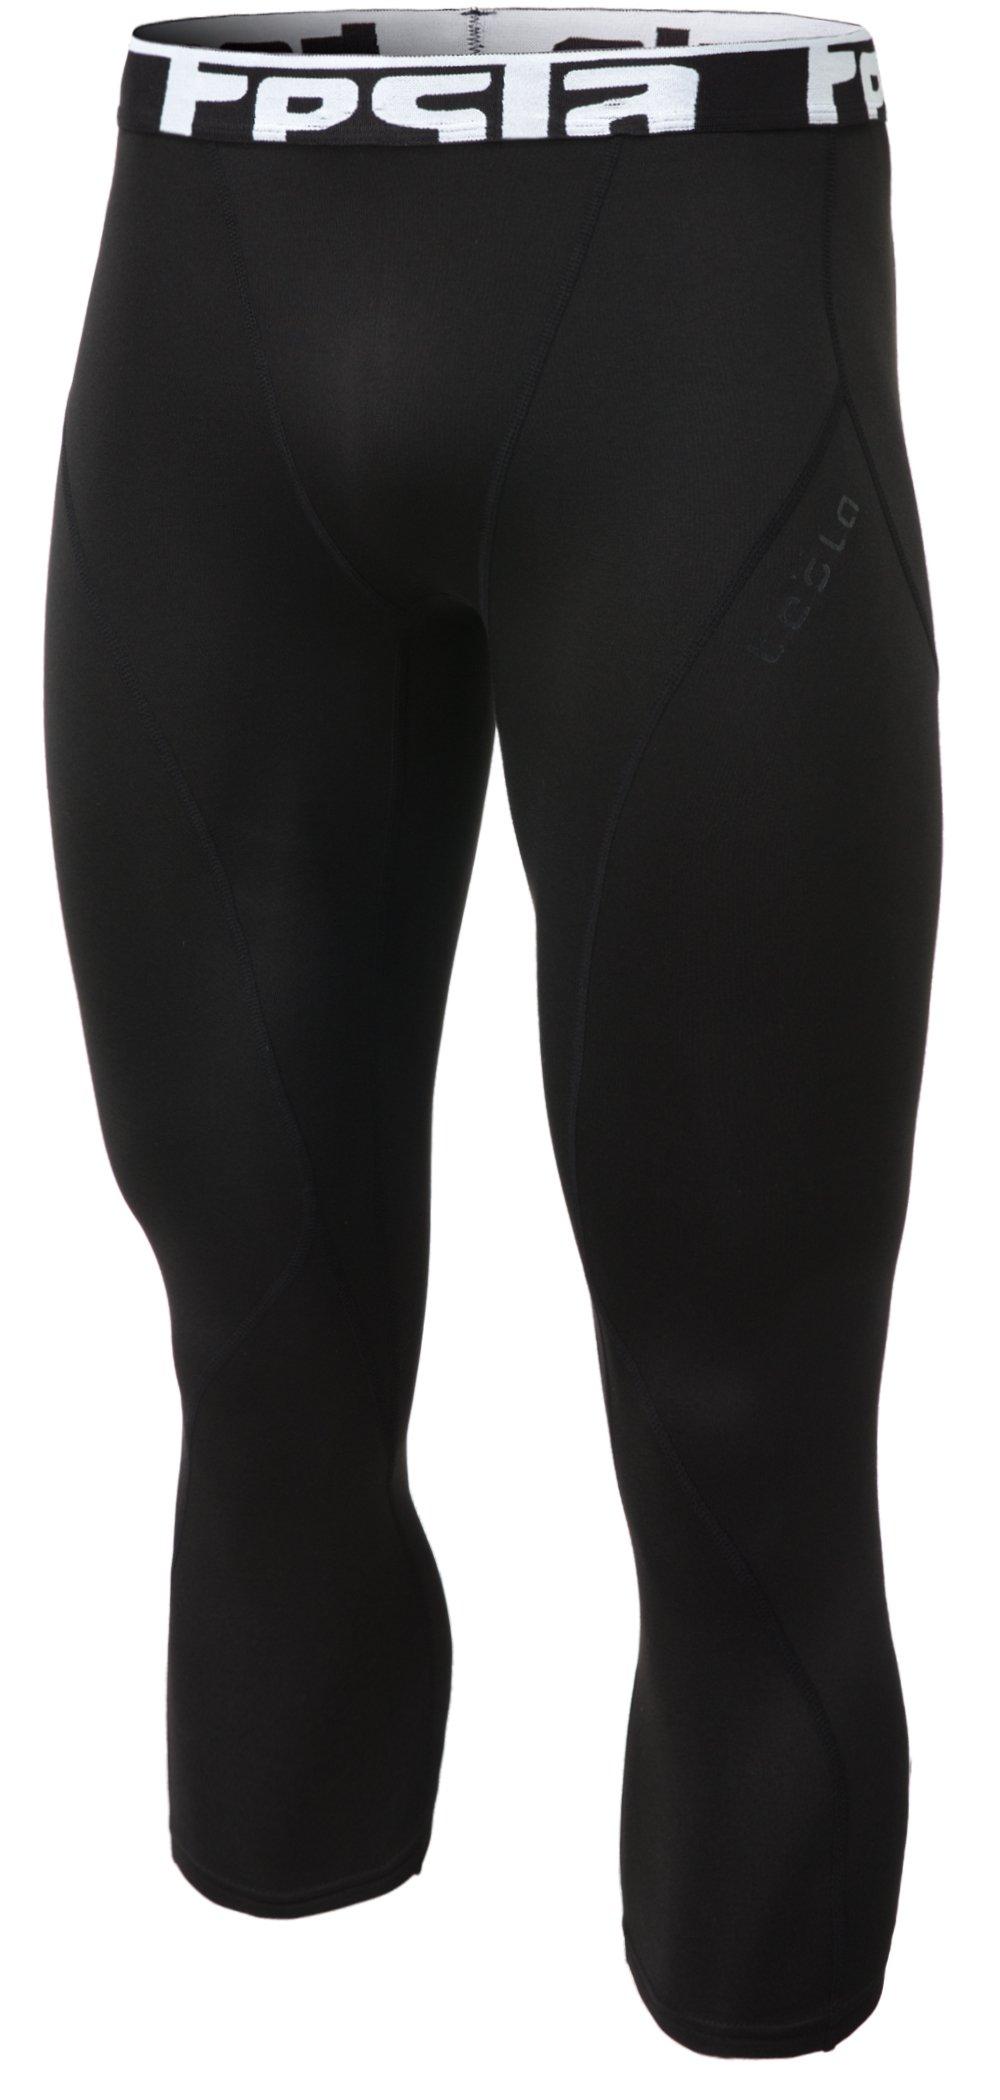 TSLA Men's Compression Capri Shorts Baselayer Cool